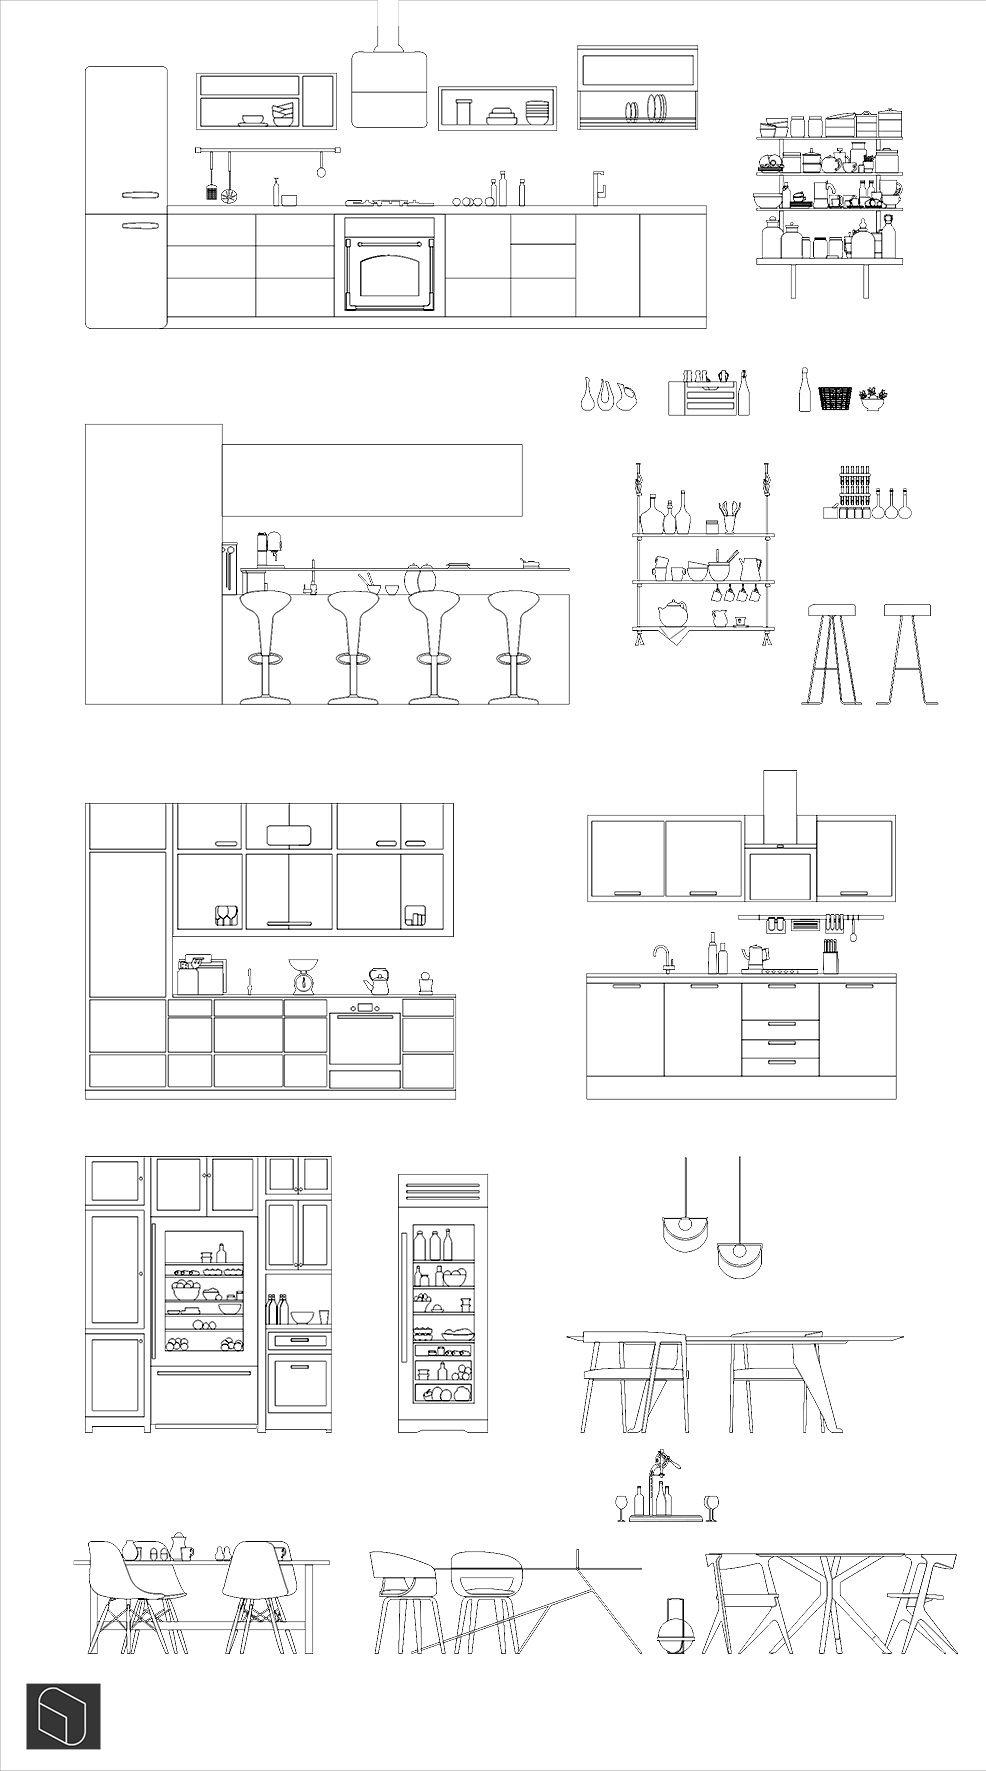 Modern Kitchen Dwg Bocetos De Diseno De Interiores Diseno De Planos Disenos De Unas